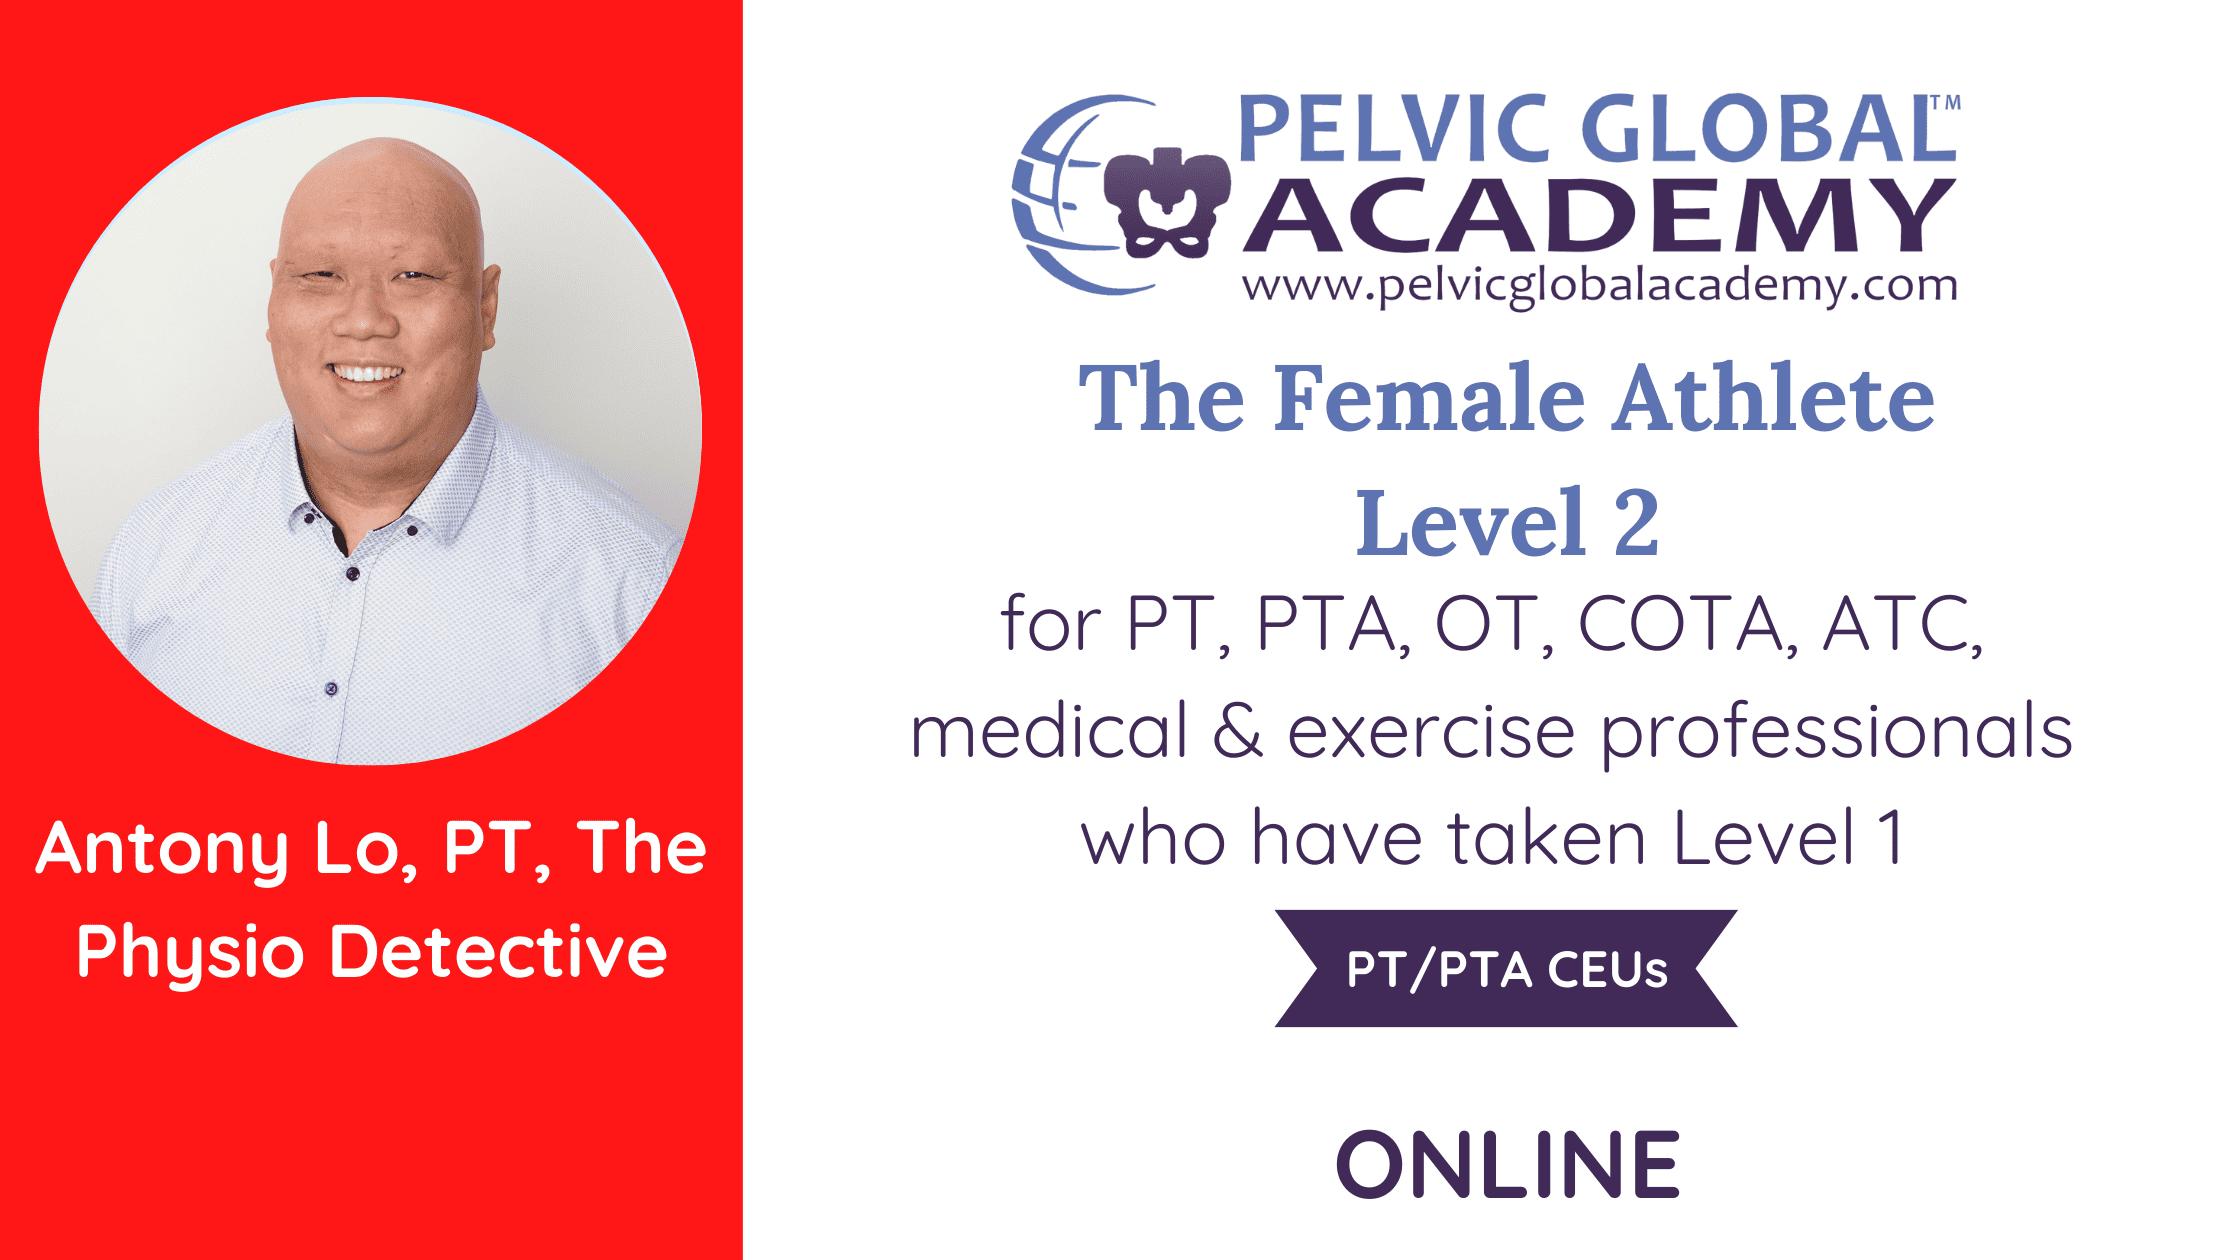 Live online Female Athlete Level 2 course with Antony Lo.